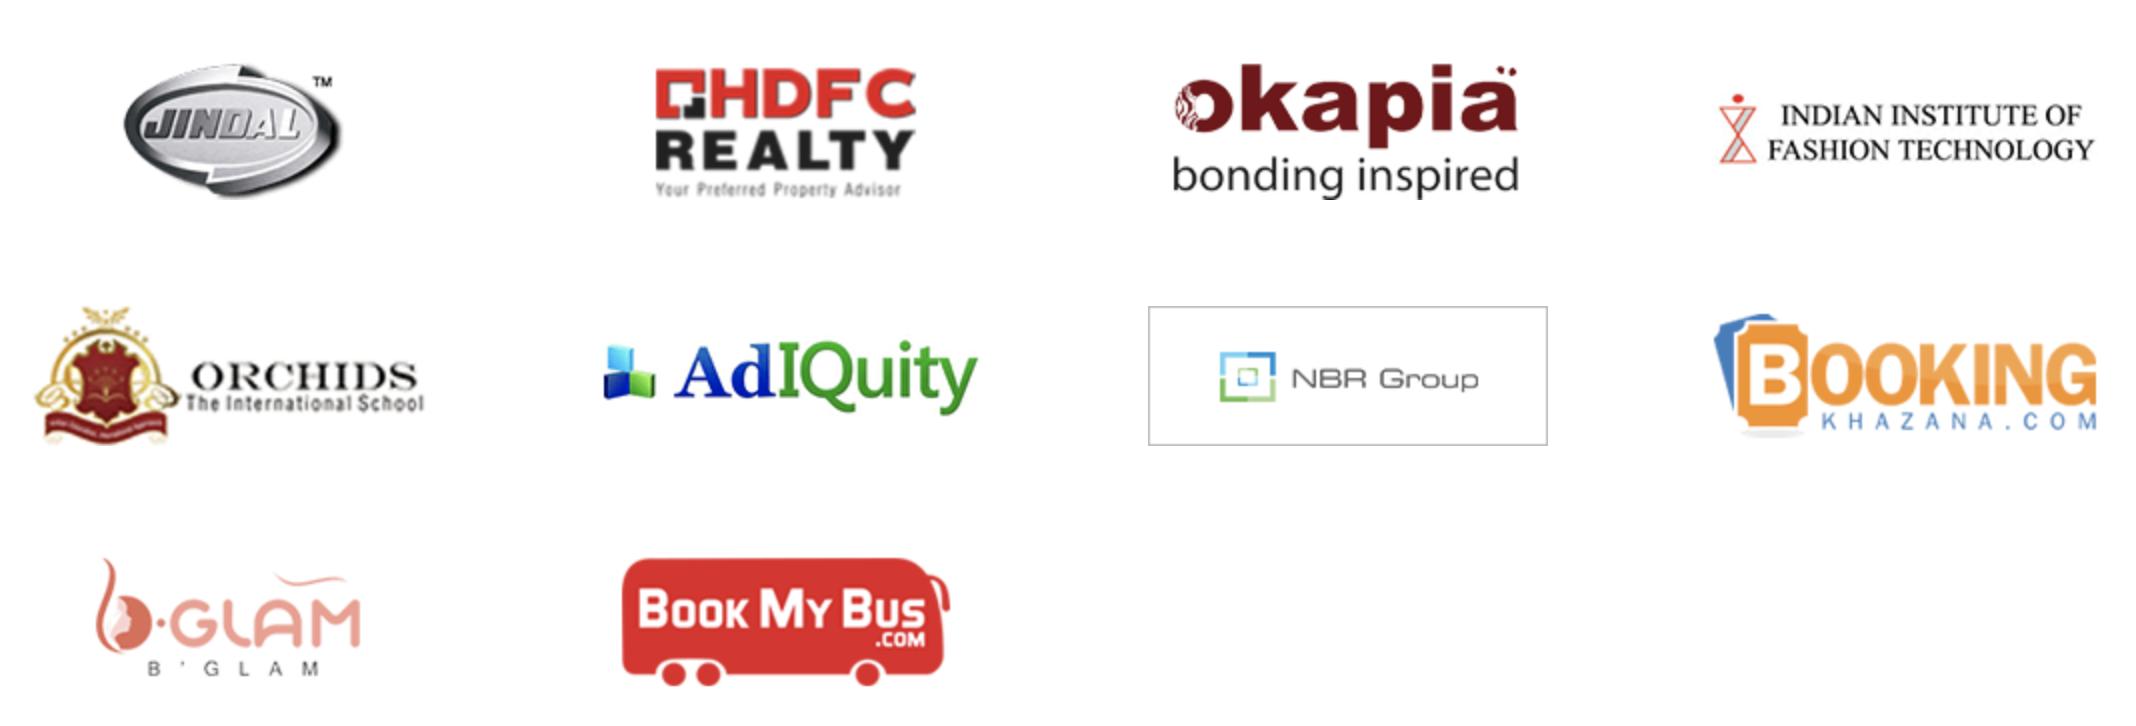 Ralecon Clients - Digital Marketing Agencies in Bangalore